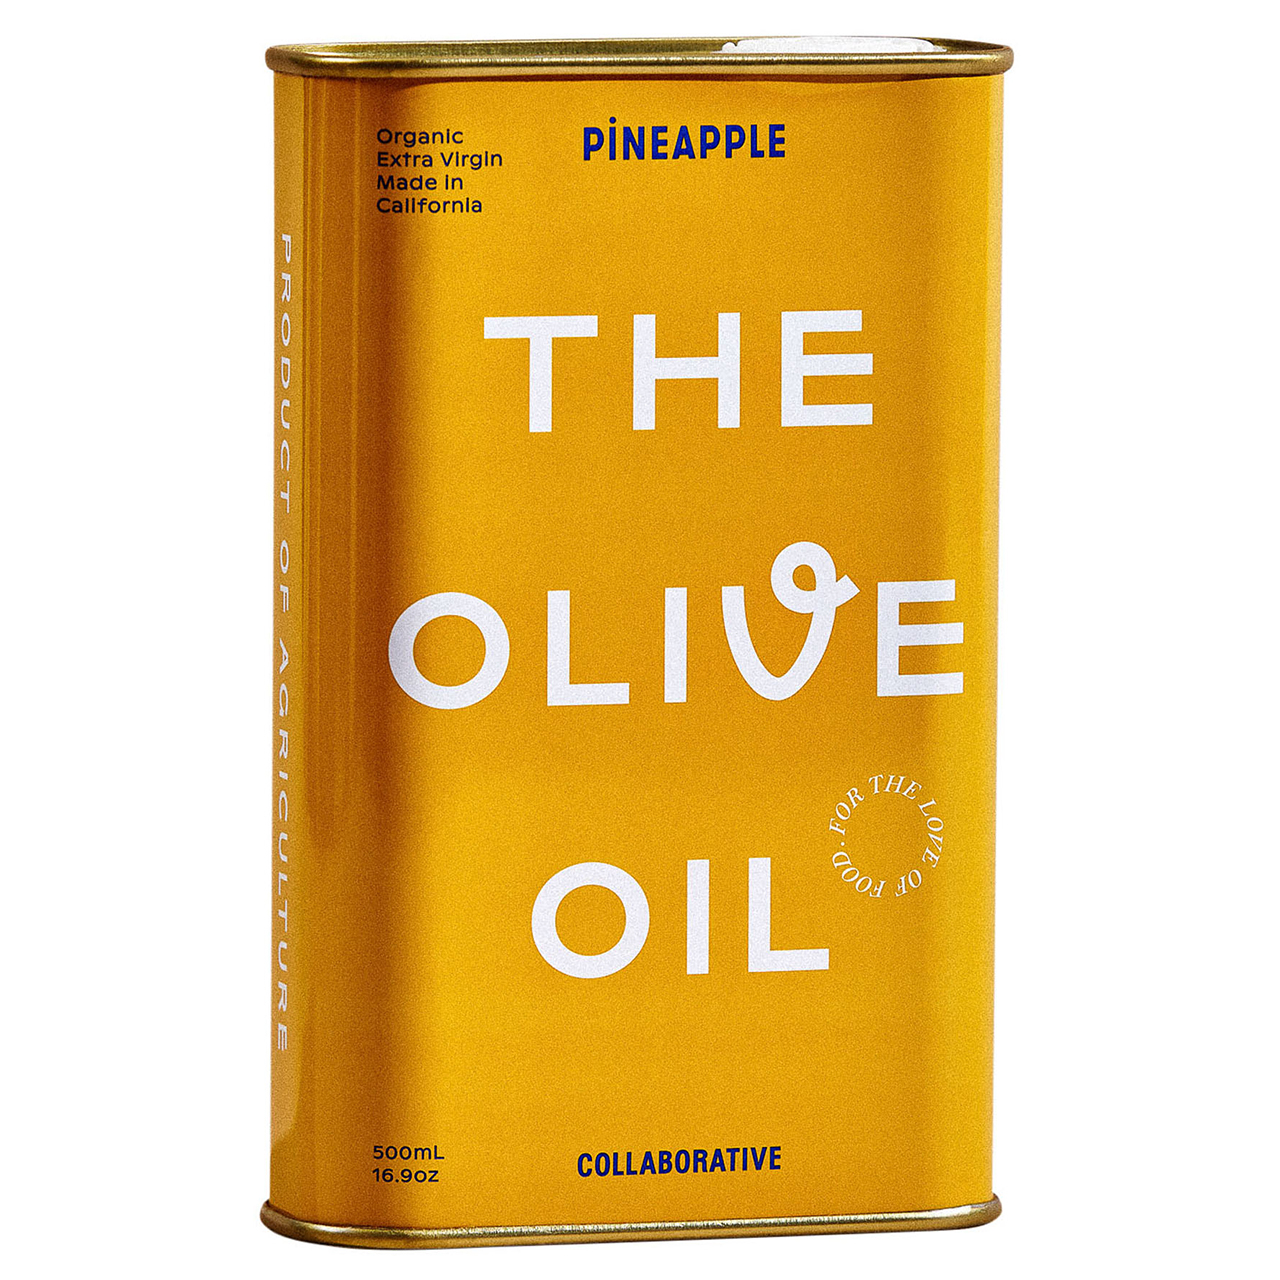 pineapple collaborative olive oil and vinegar